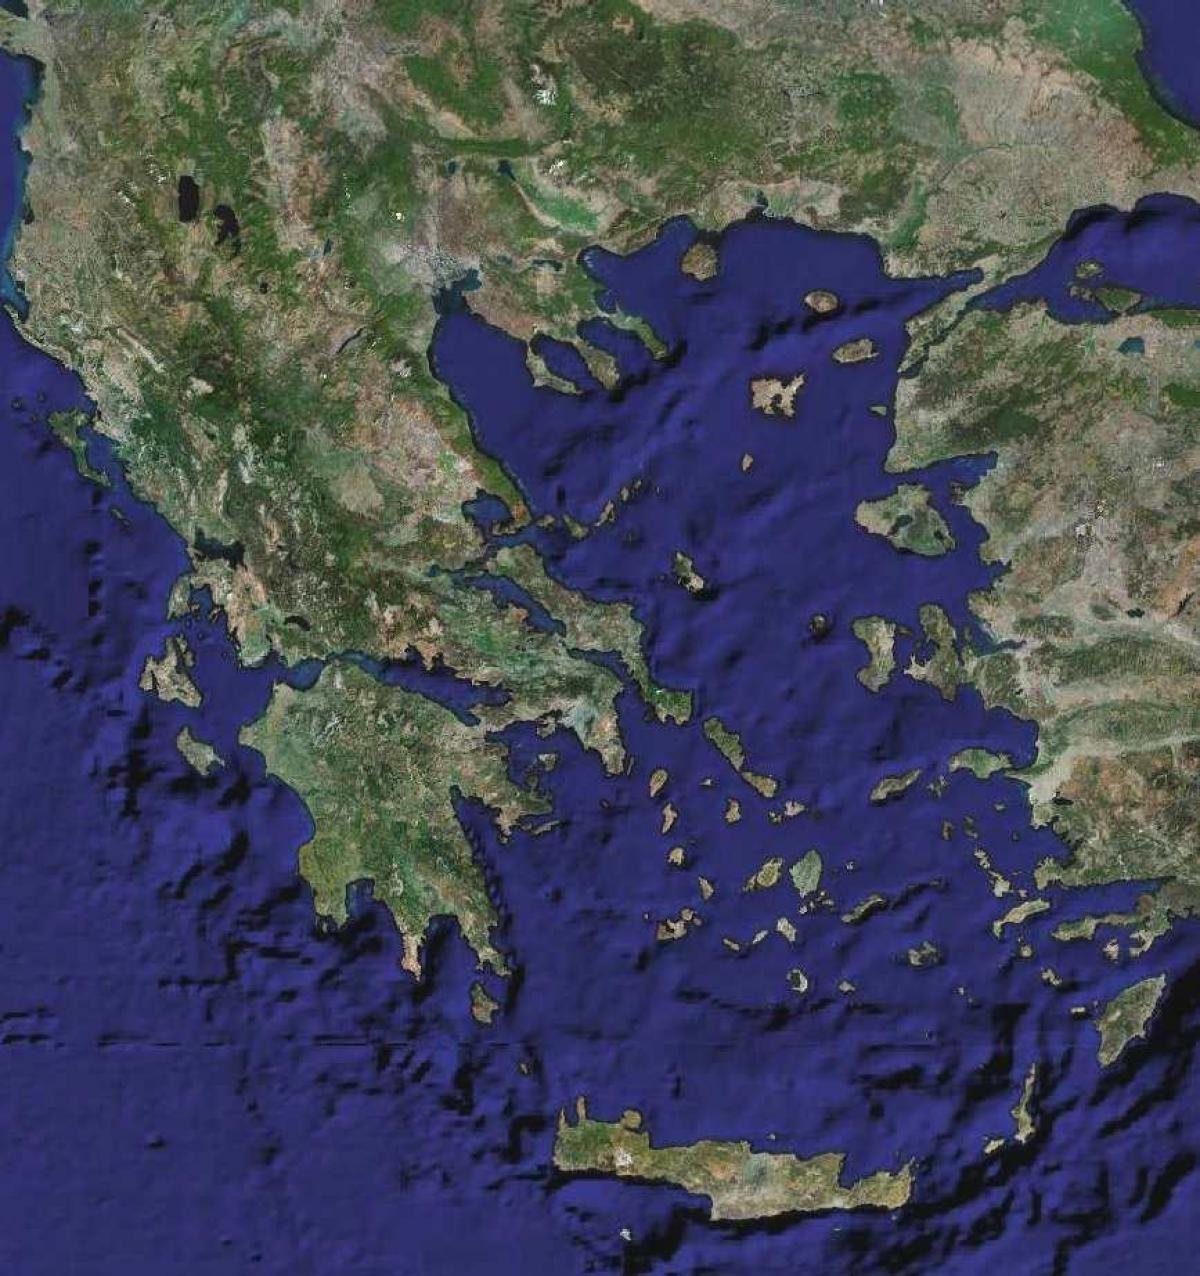 Grecia Harta Prin Satelit Harta Grecia Prin Satelit Europa De